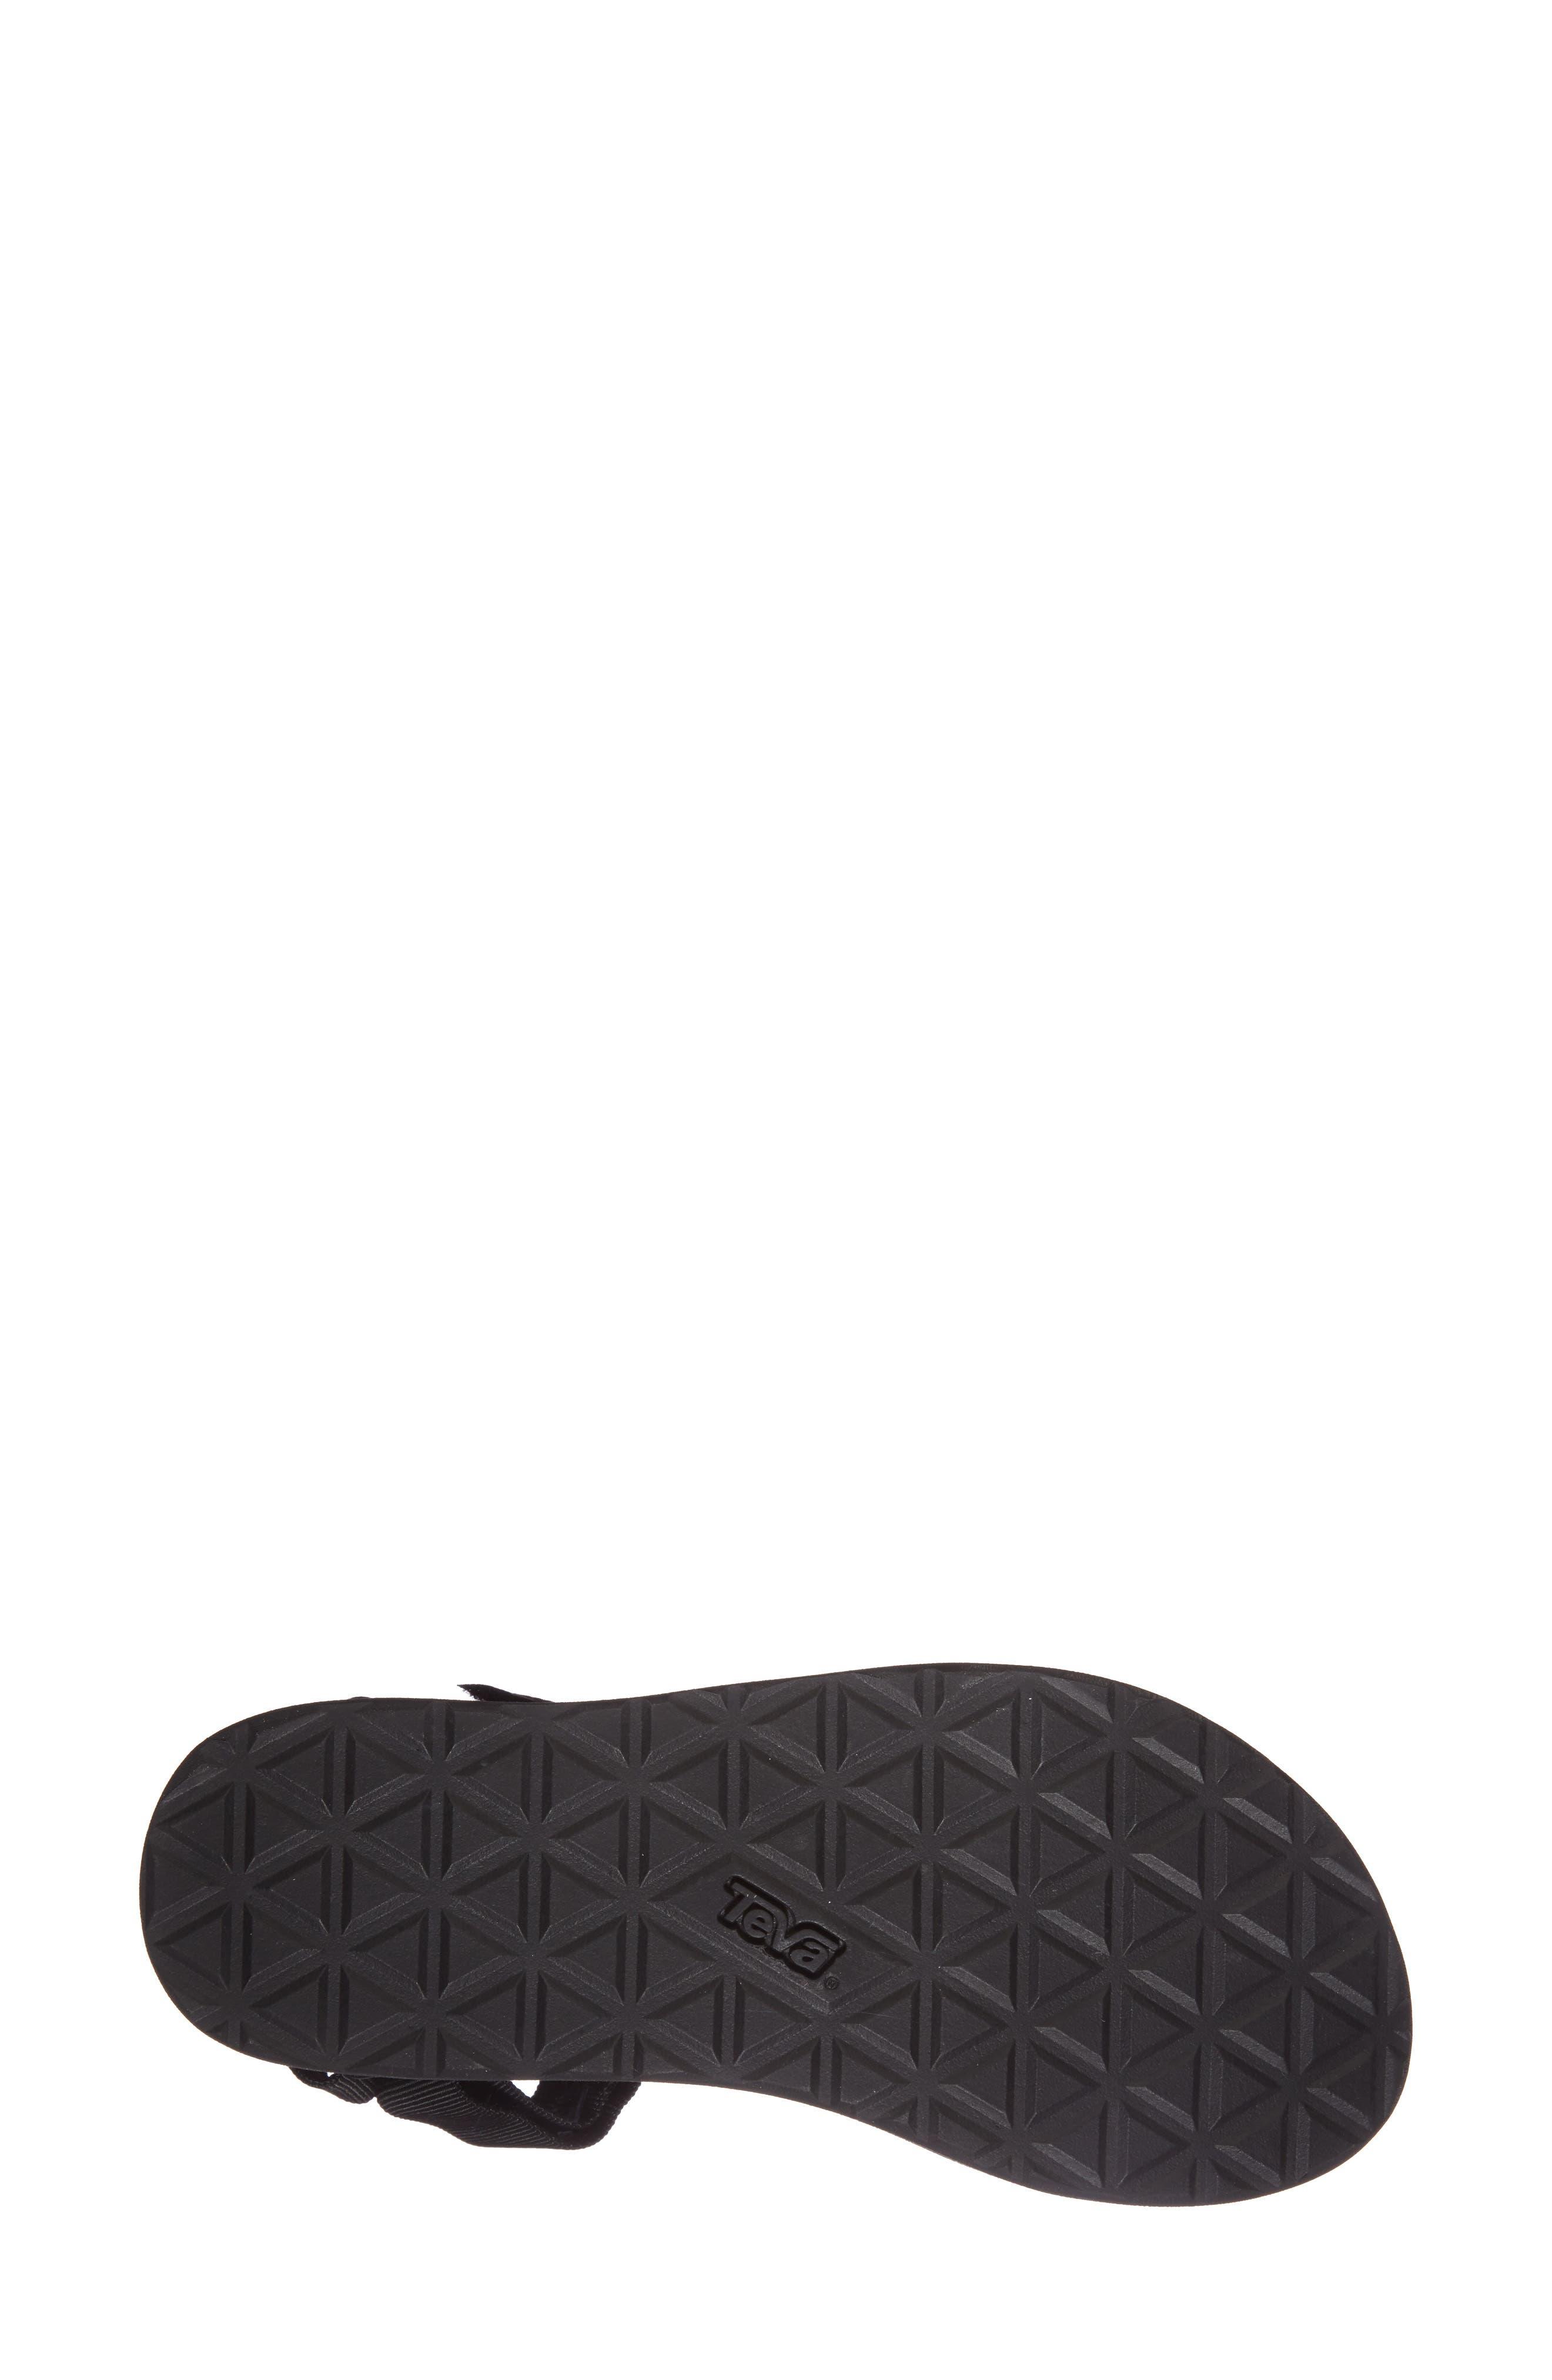 'Universal' Flatform Sandal,                             Alternate thumbnail 4, color,                             001